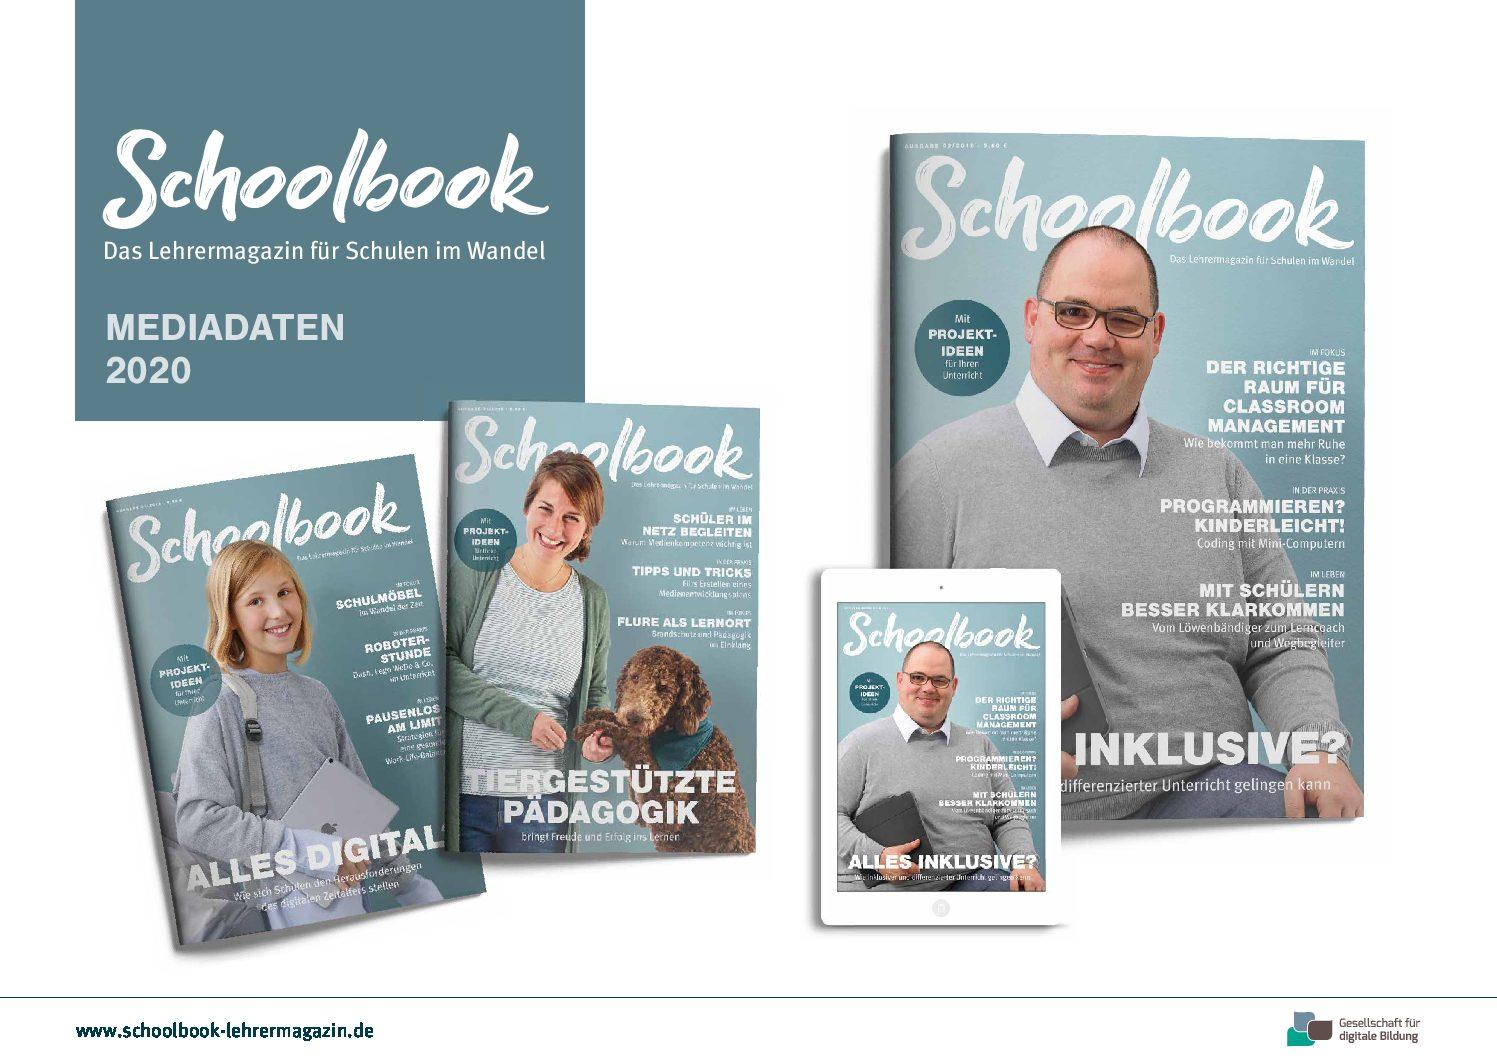 Mediadaten_Schoolbook_2020